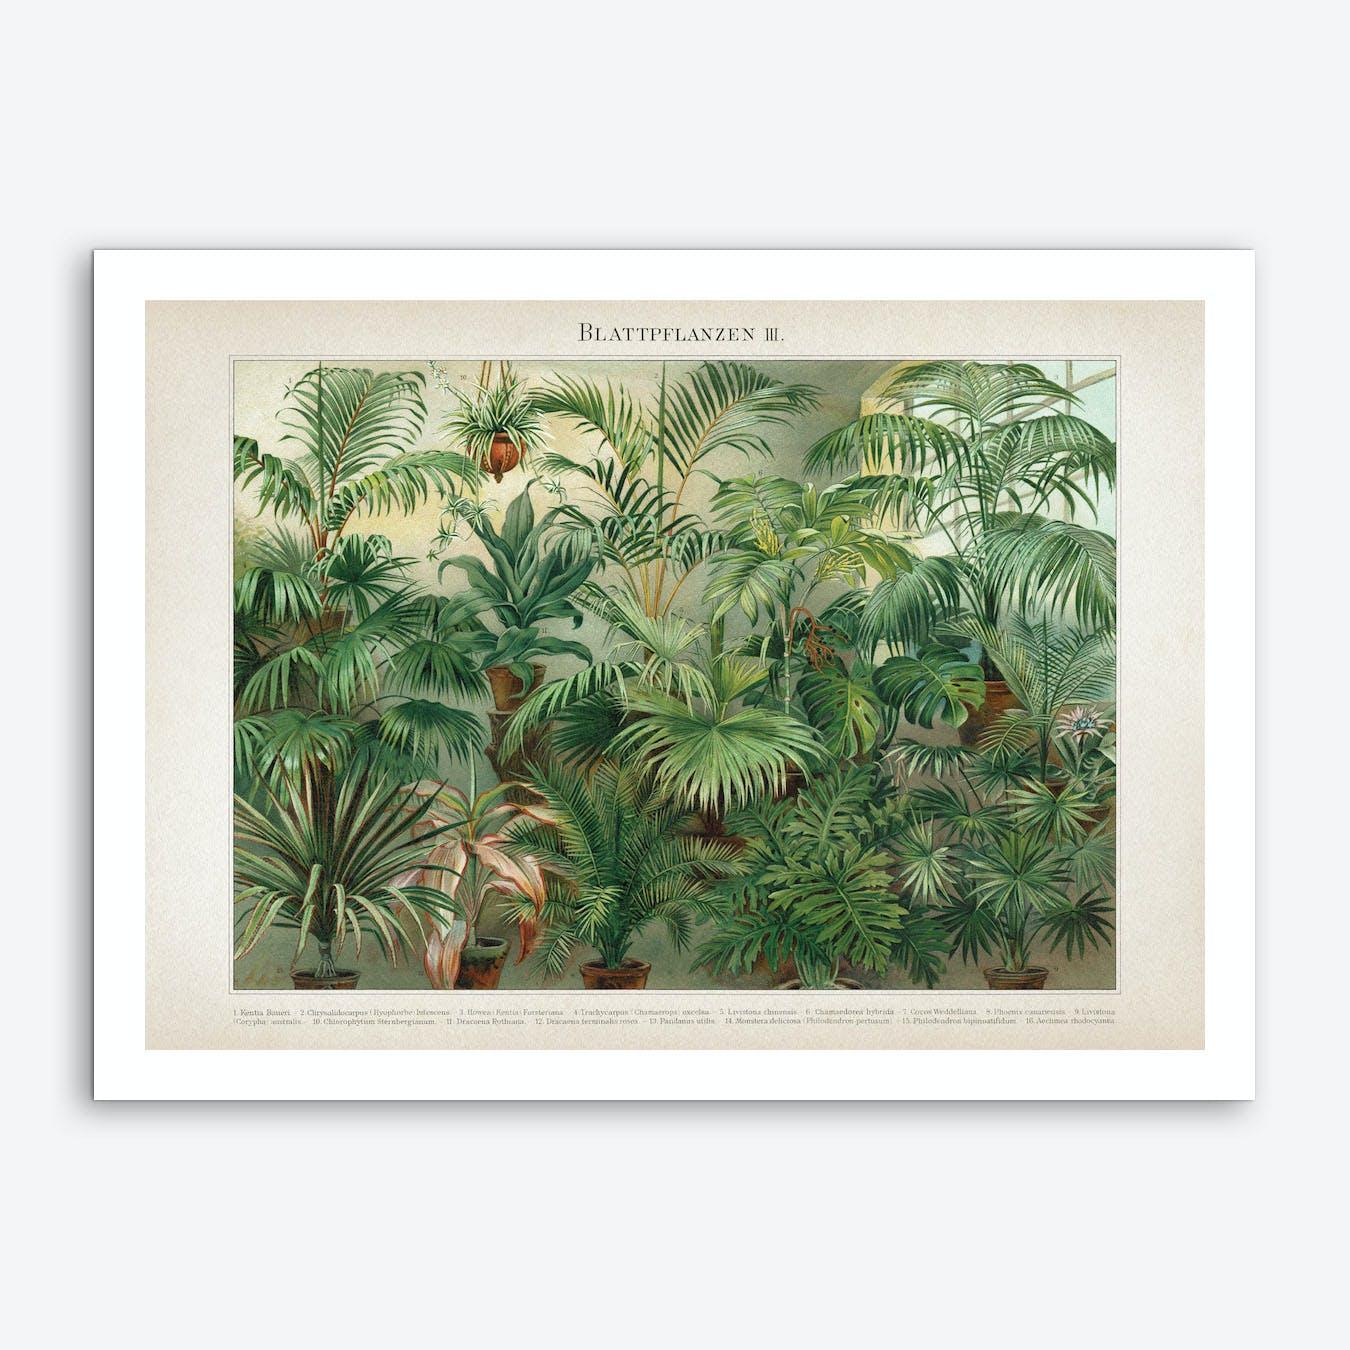 Vintage Meyers 5 Blattpflanzen 3 Art Print